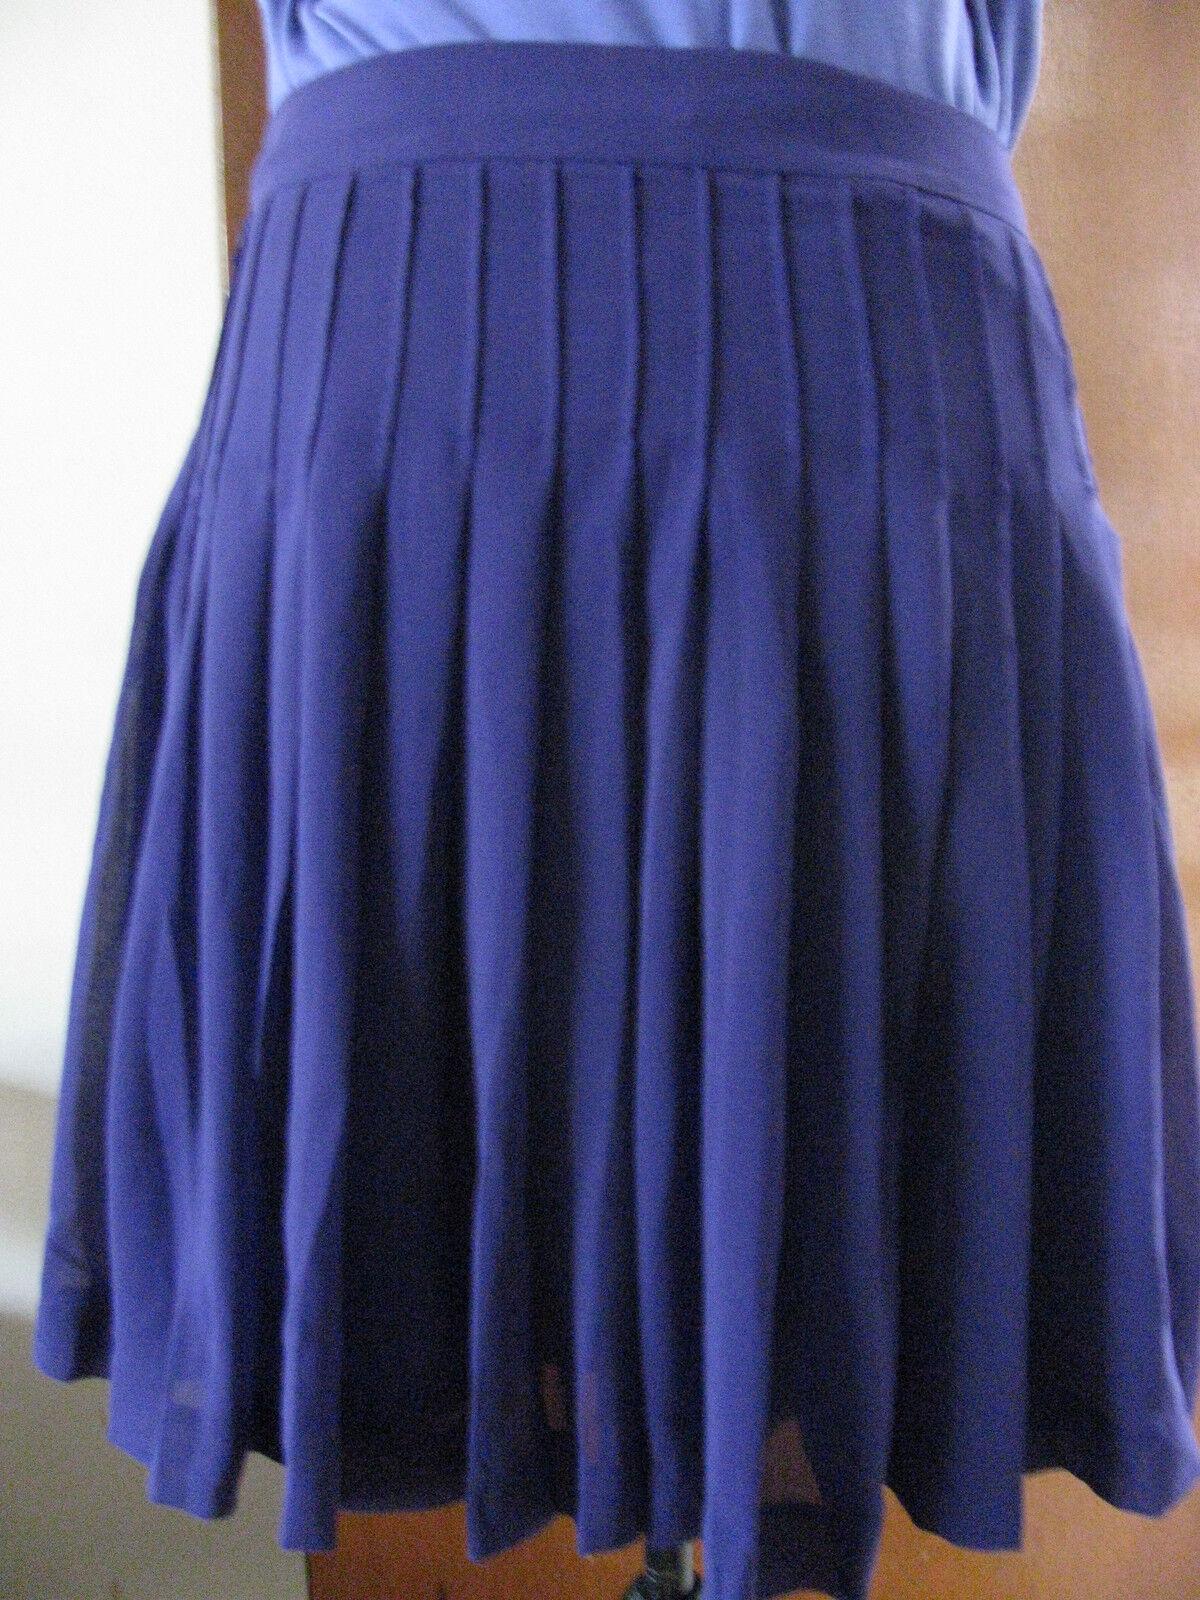 Gap women's purple lined pleated skirt Size 10,12 NWT